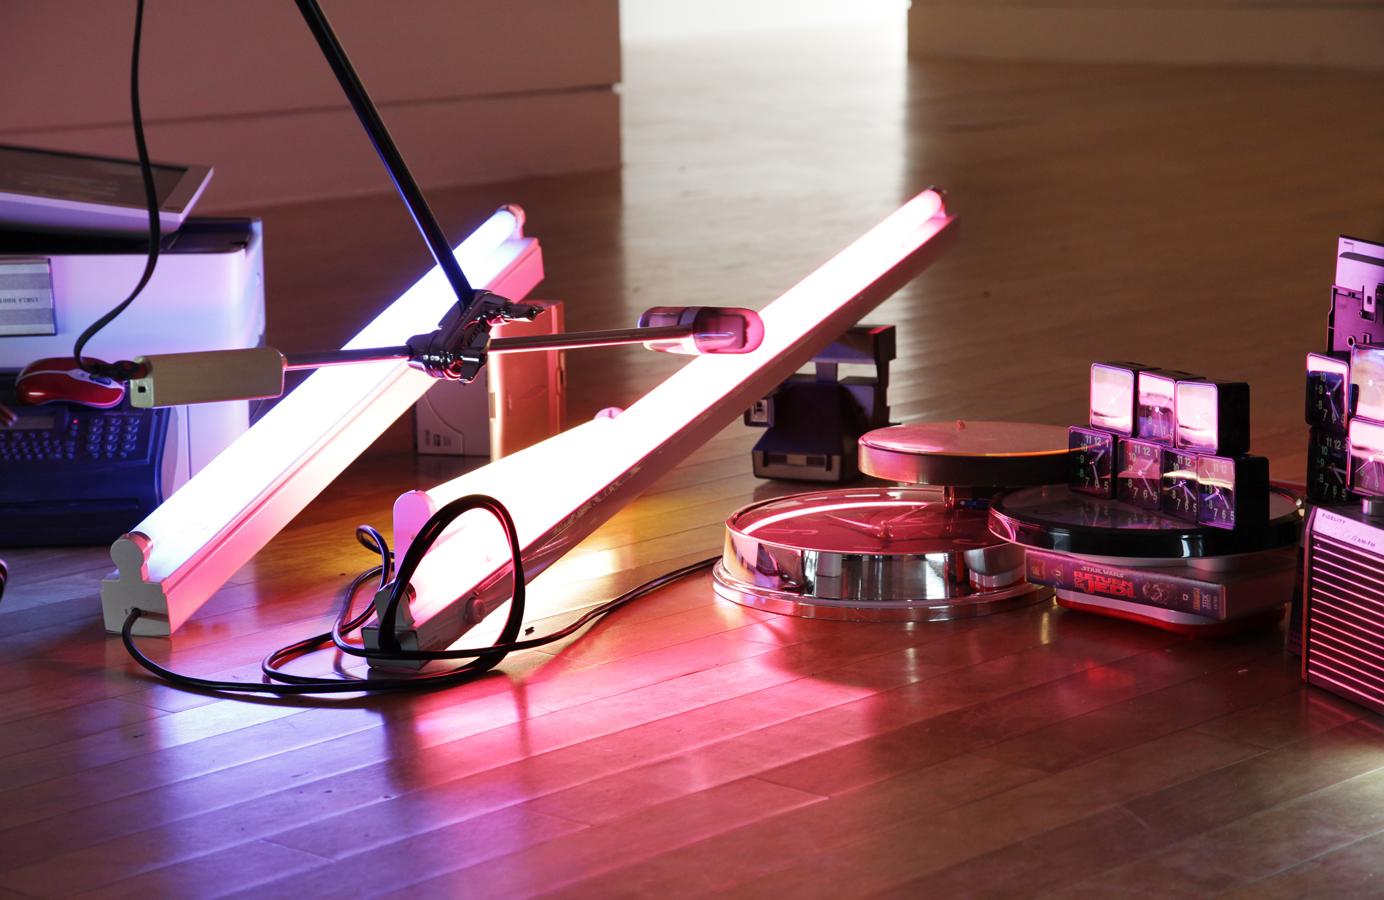 'Electroprobe Installation #5', 2014| Troika (Eva Rucki, Sebastien Noel, Conny Freyer)